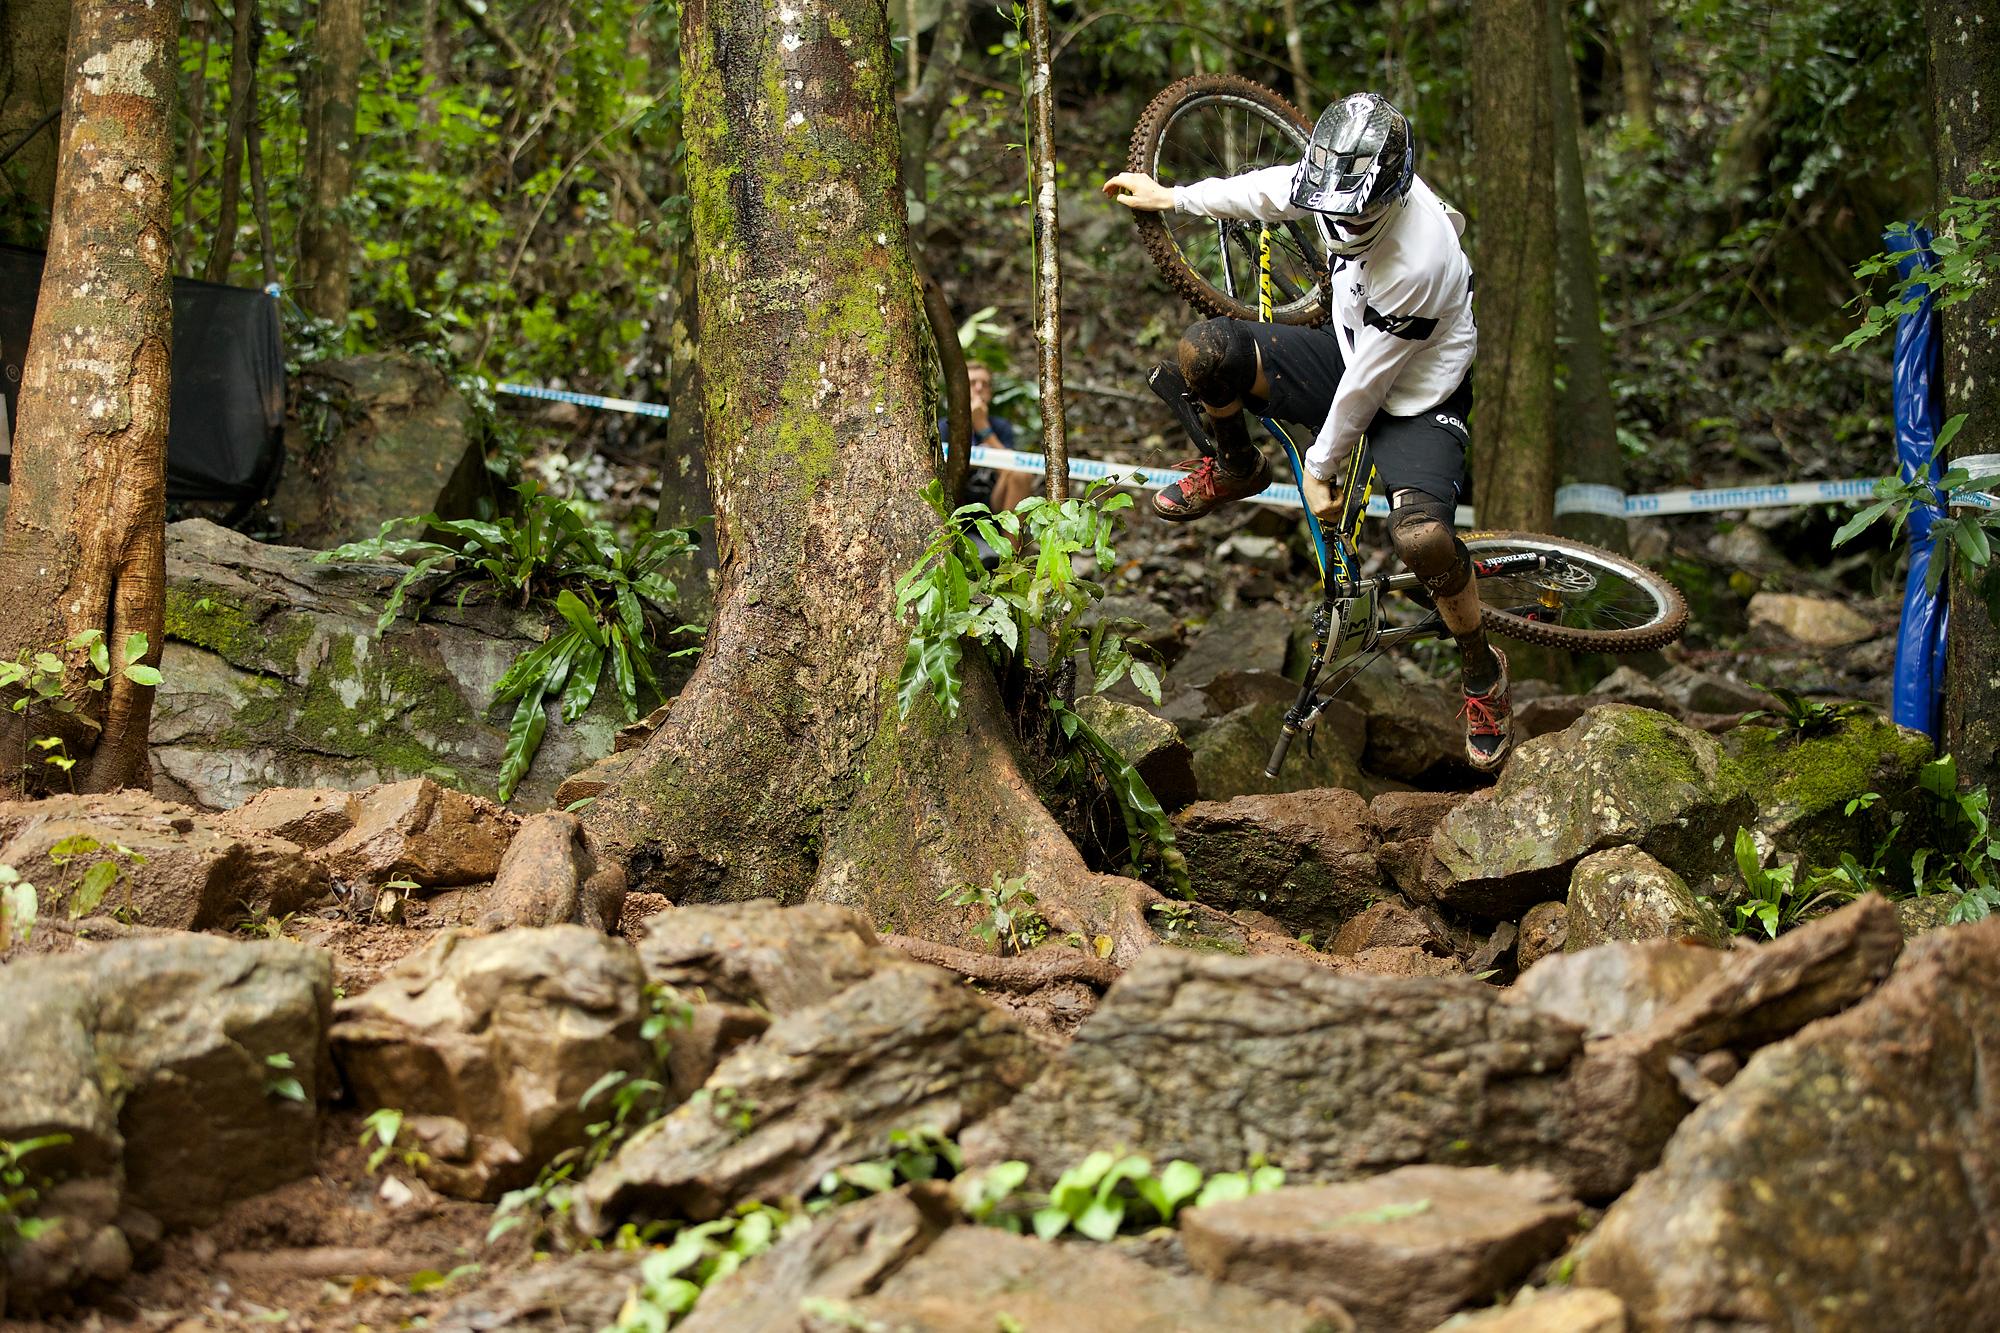 Kiwi junior Keegan Wright gets a closer look at the rock garden.